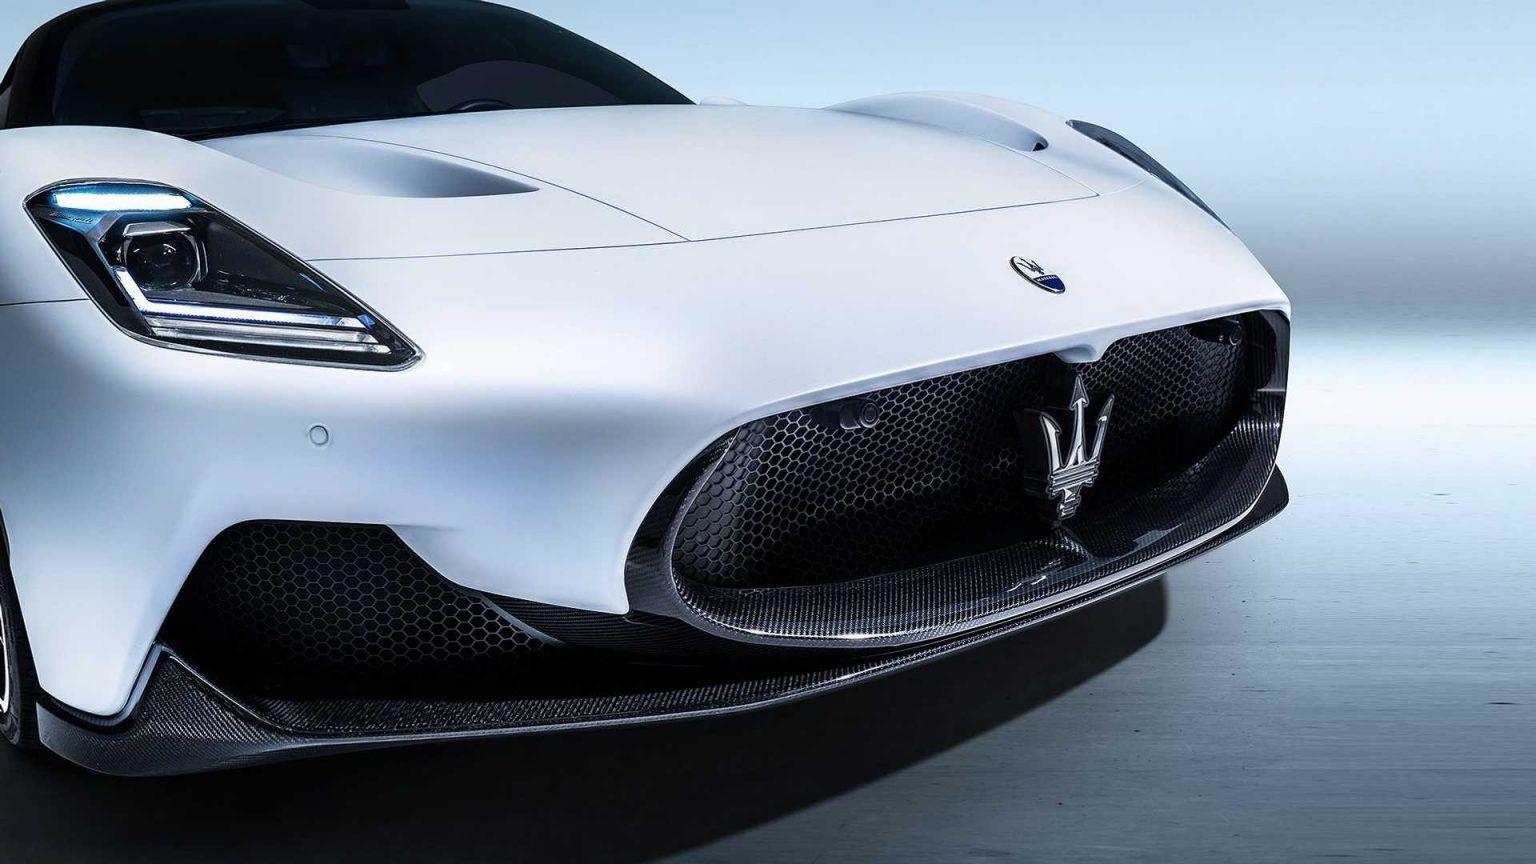 33+ Maserati new supercar Full HD